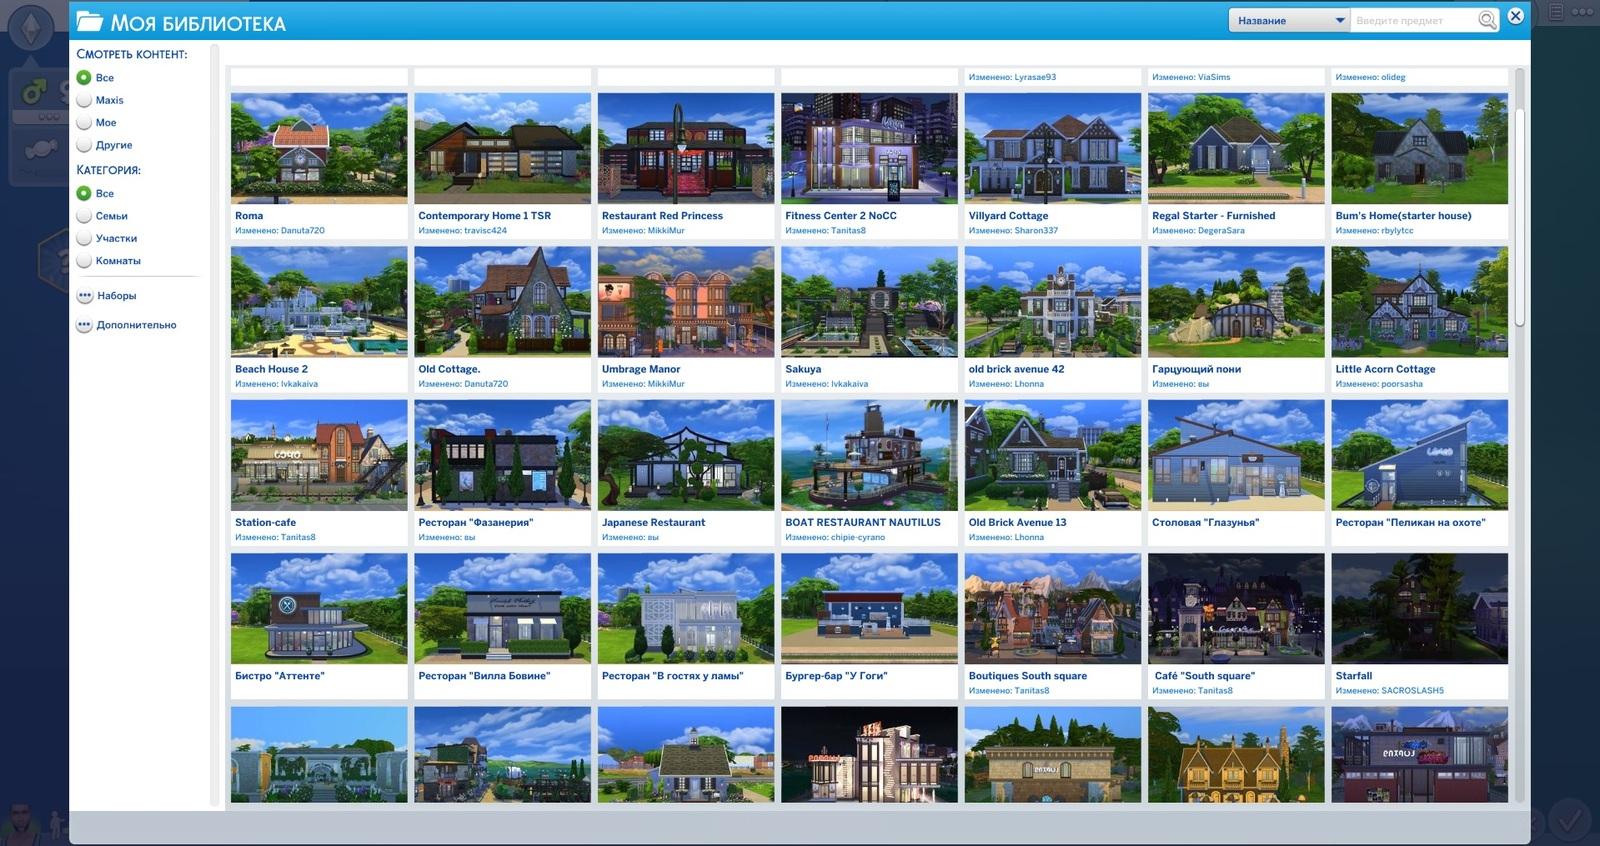 Сборки Модов для Sims 4